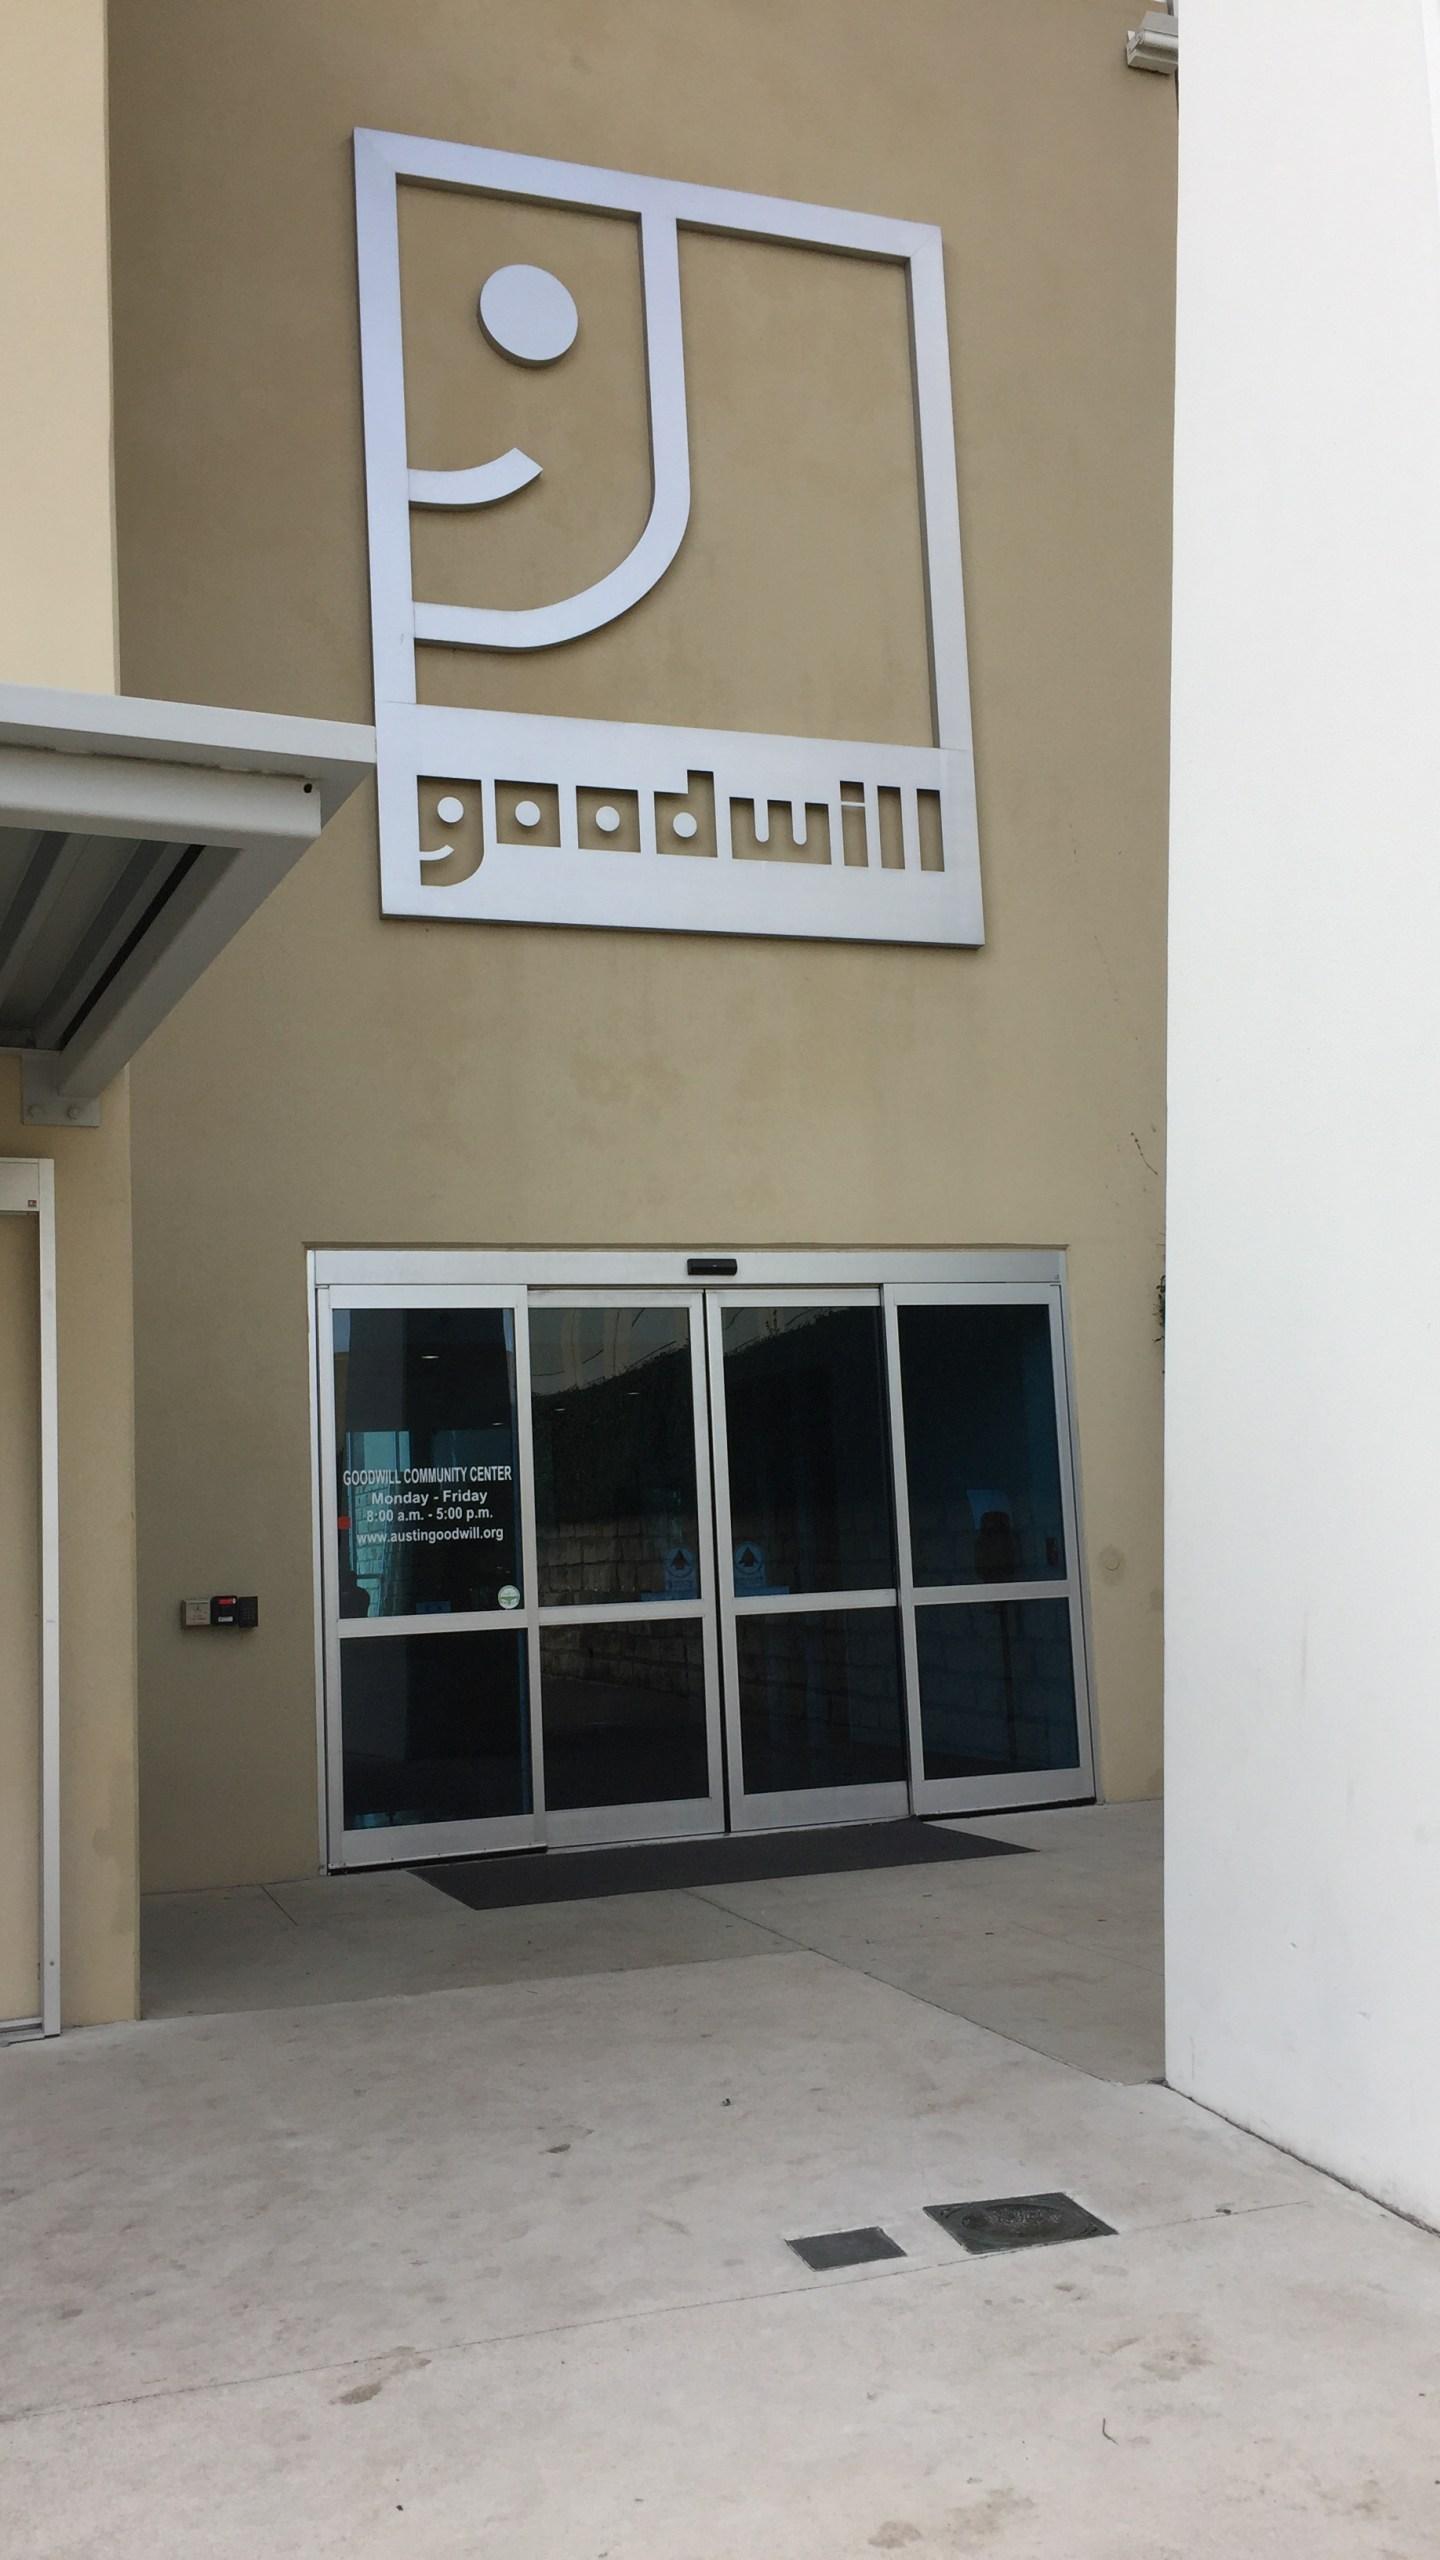 Goodwill Central Texas Community Center_597342